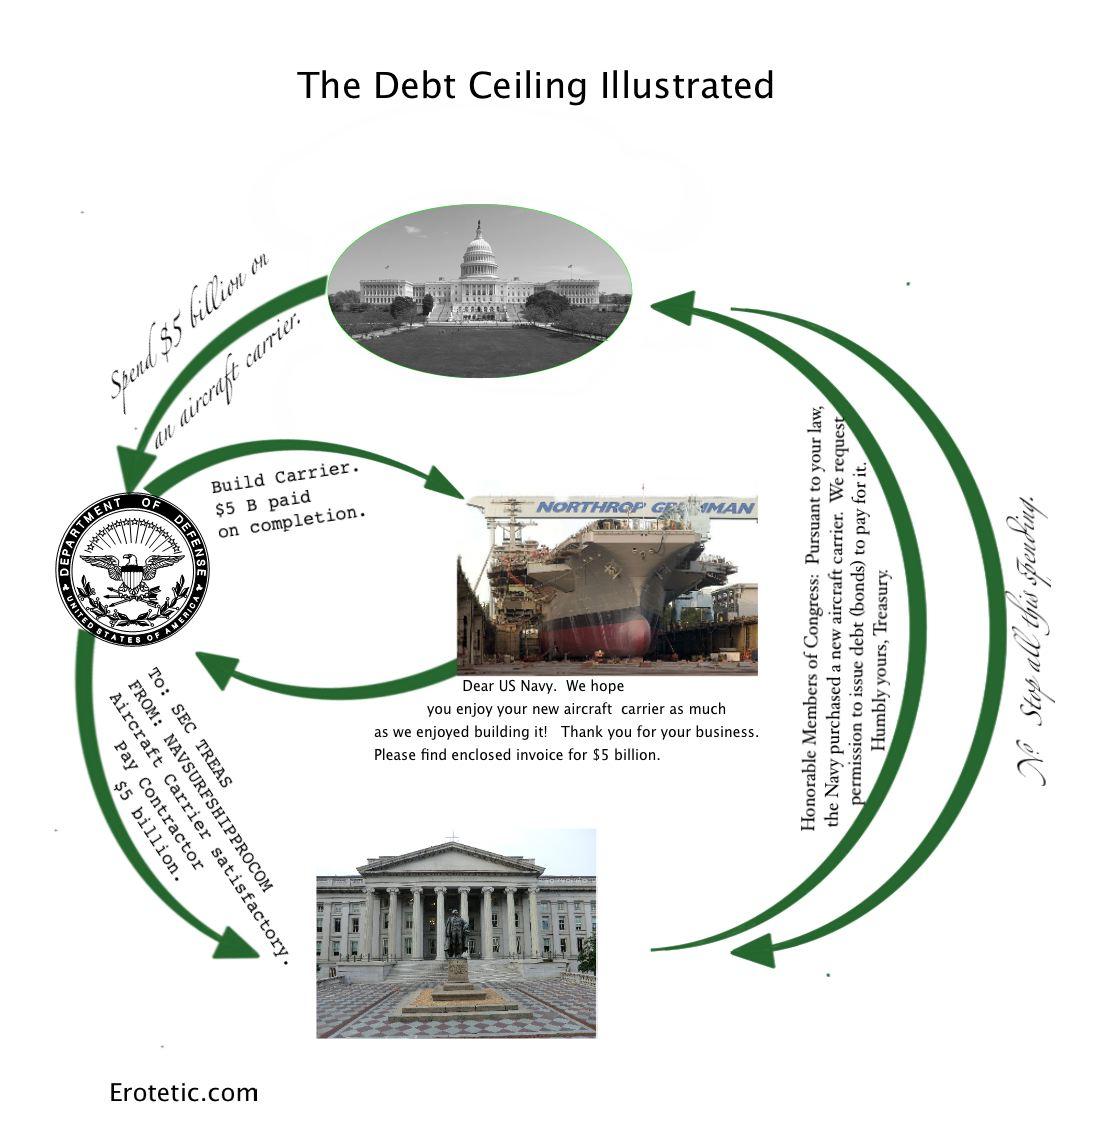 Debt ceiling illustrated